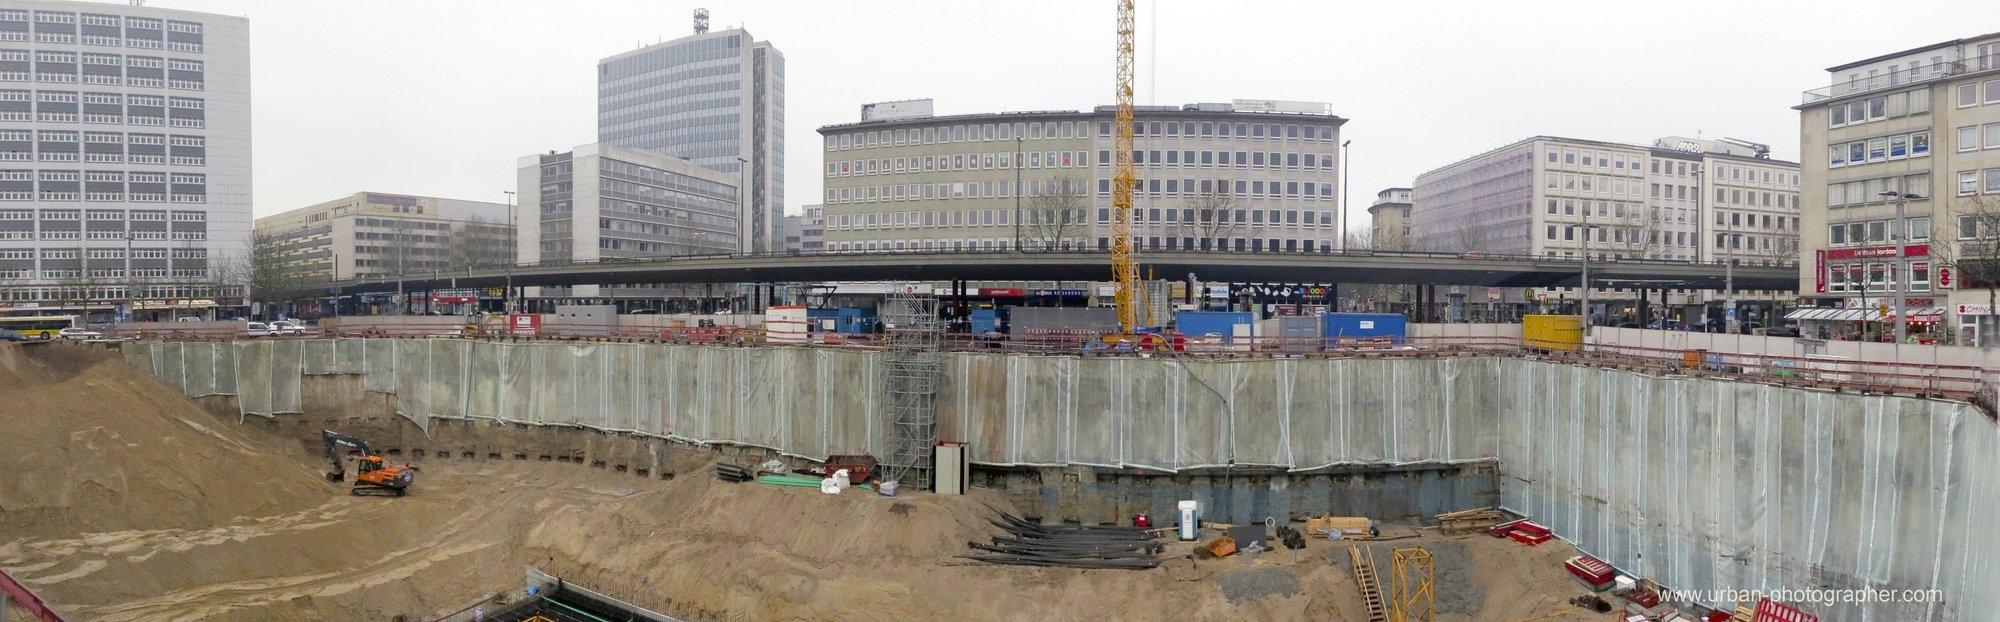 Baustelle Bahnhofsplatz 95